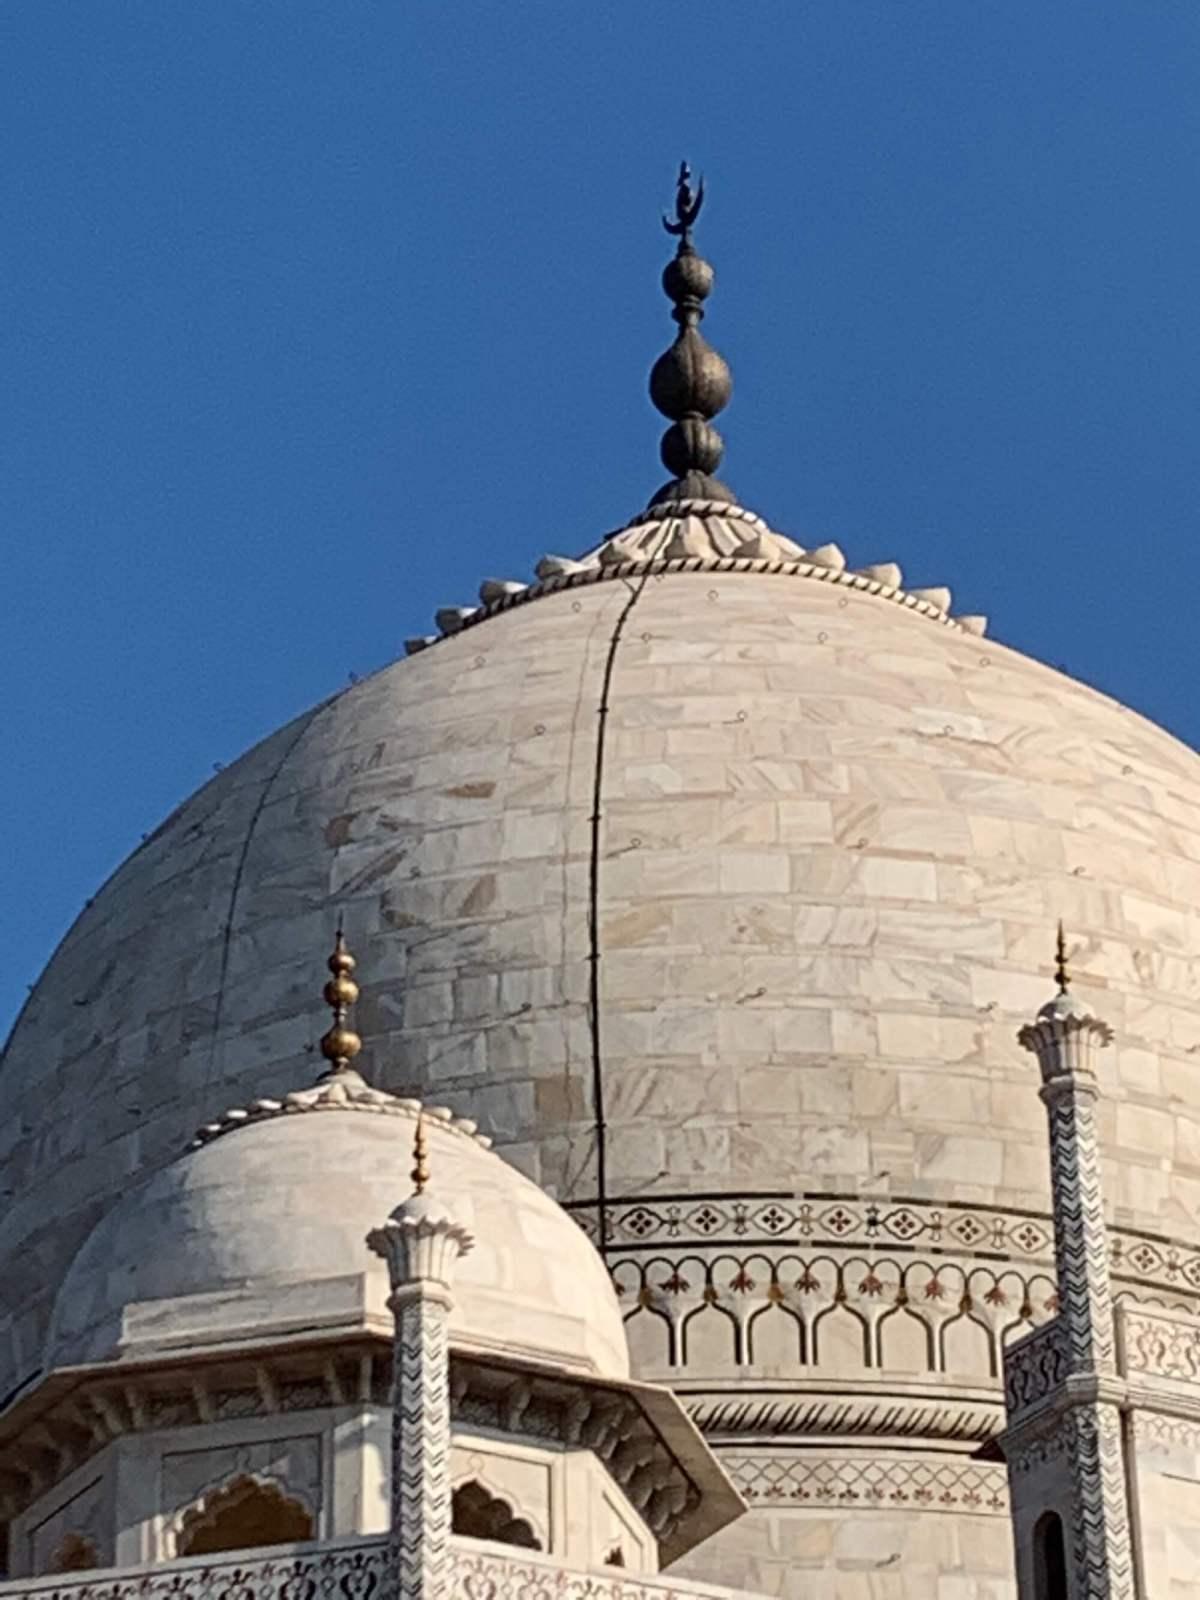 The dome and pinnacle of Taj Mahal